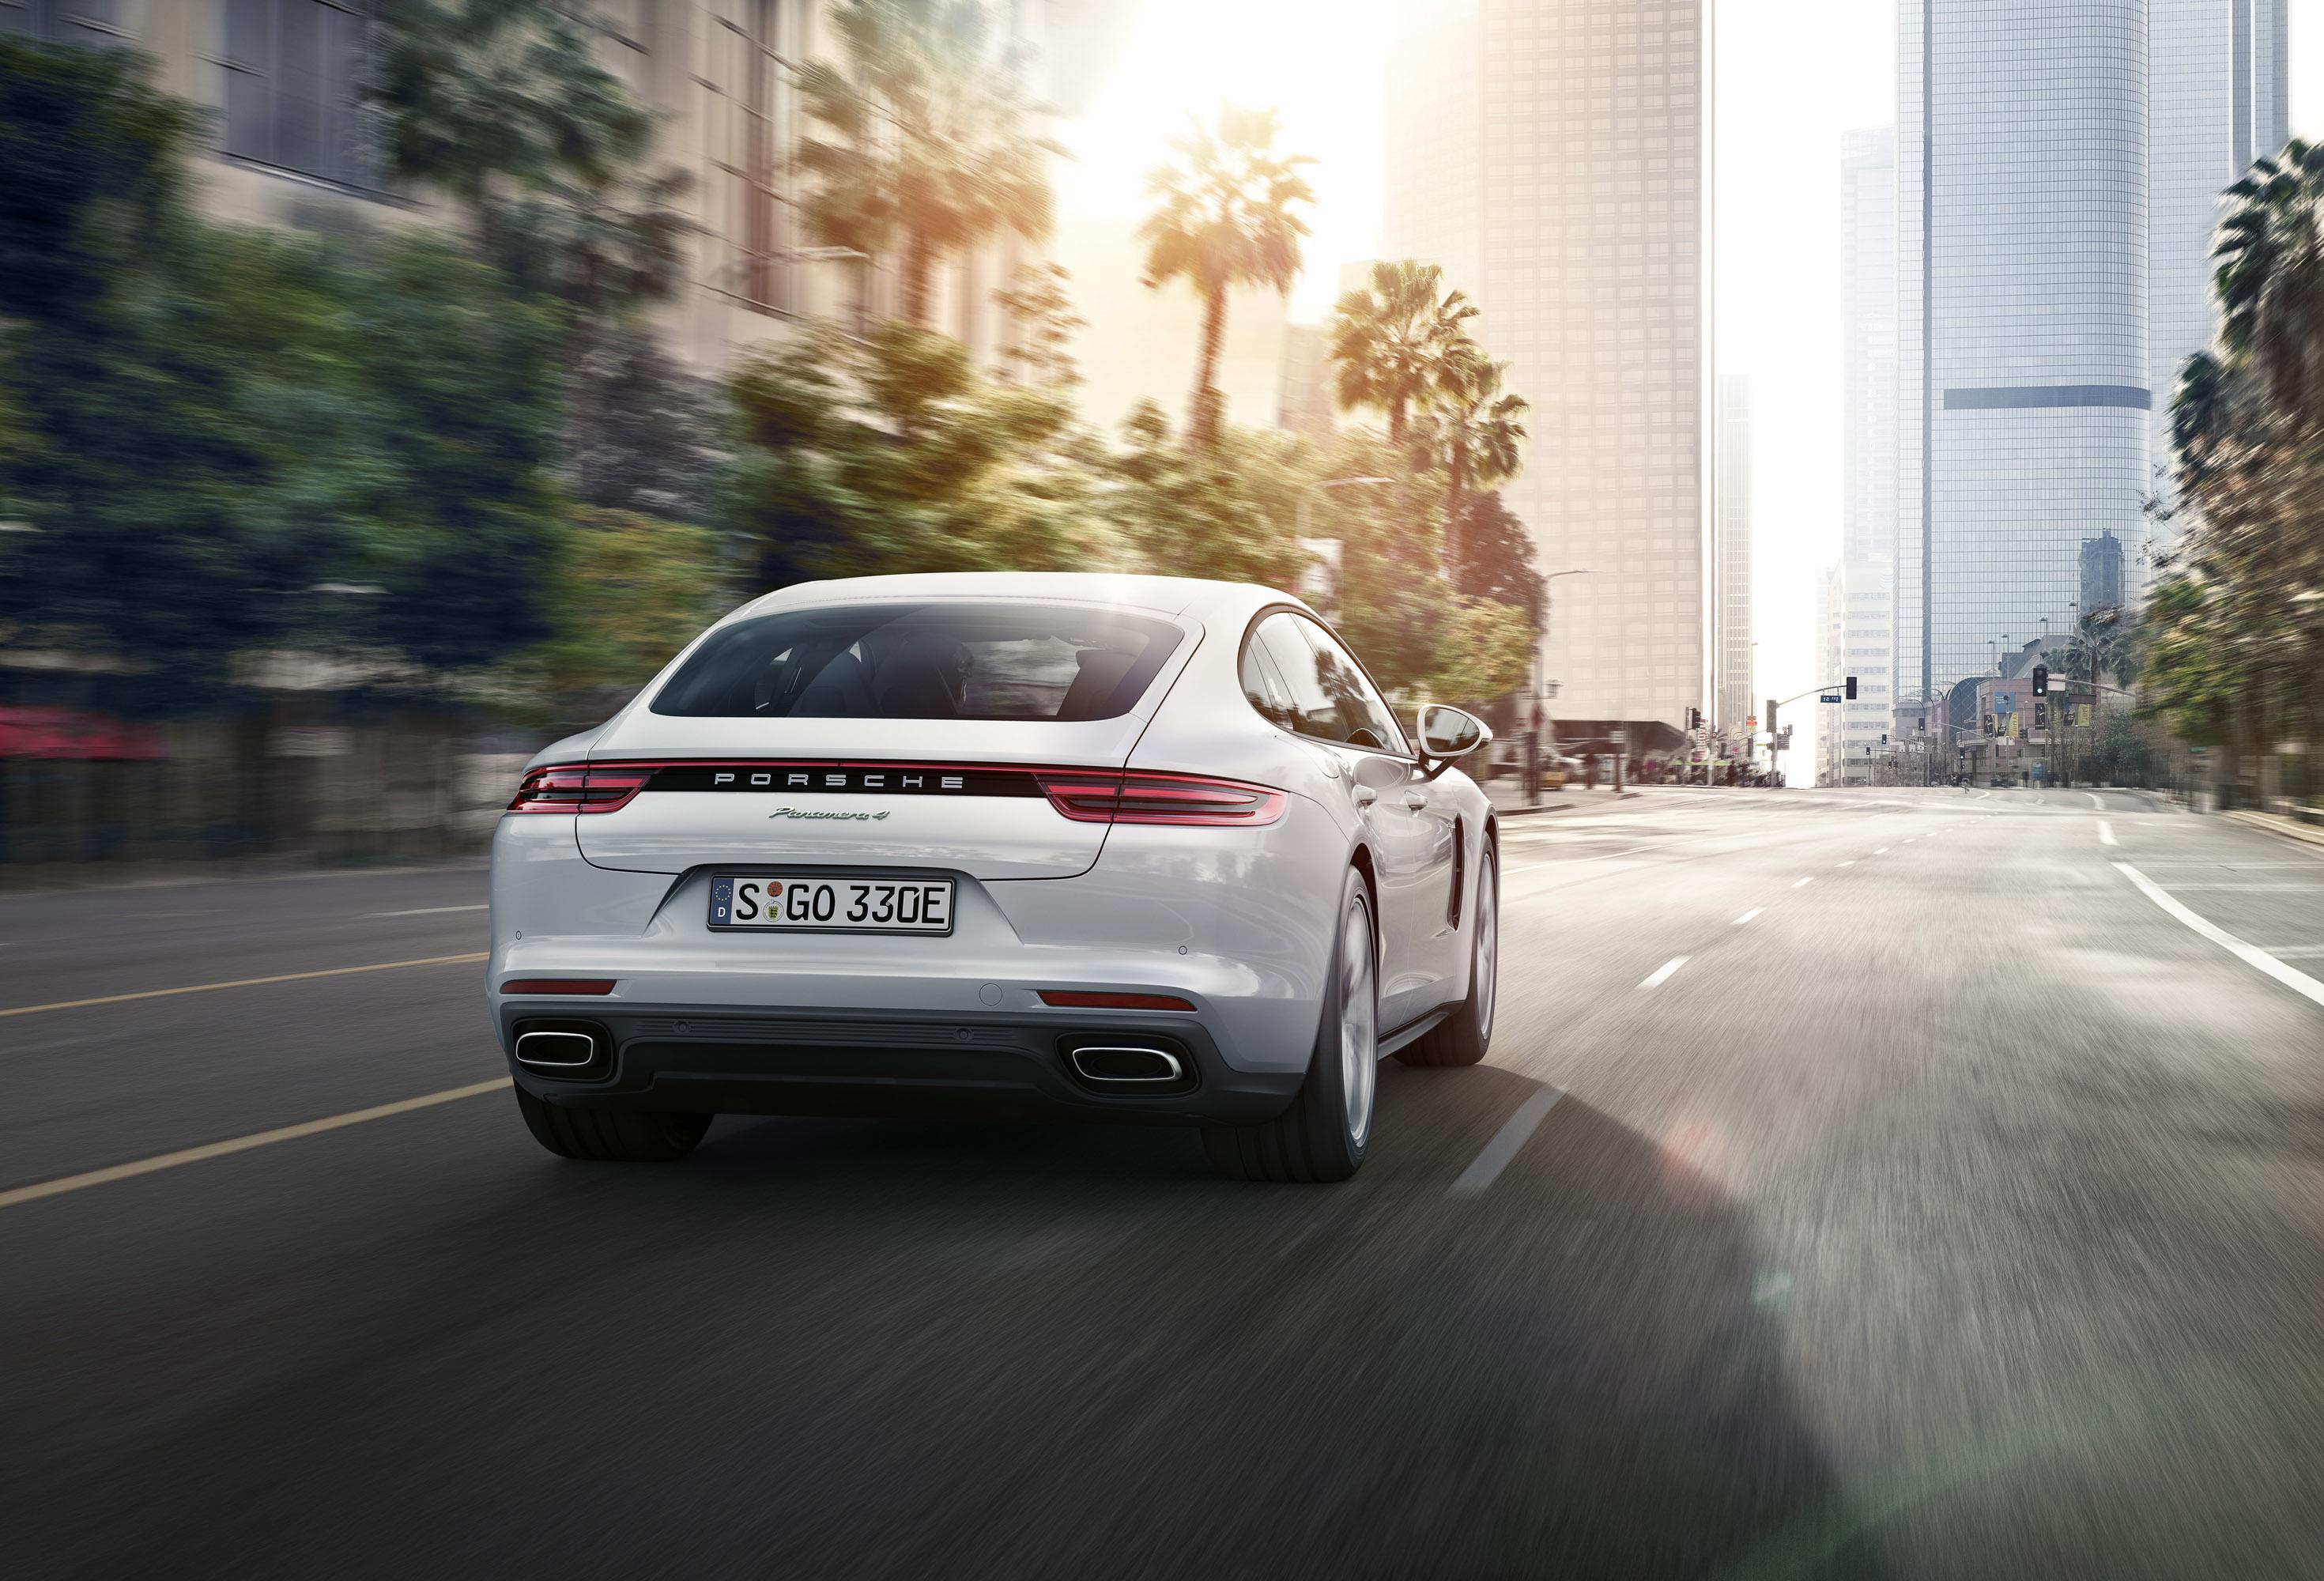 2018 Porsche Panamera 4 E Hybrid Is Revealed A Month Ahead